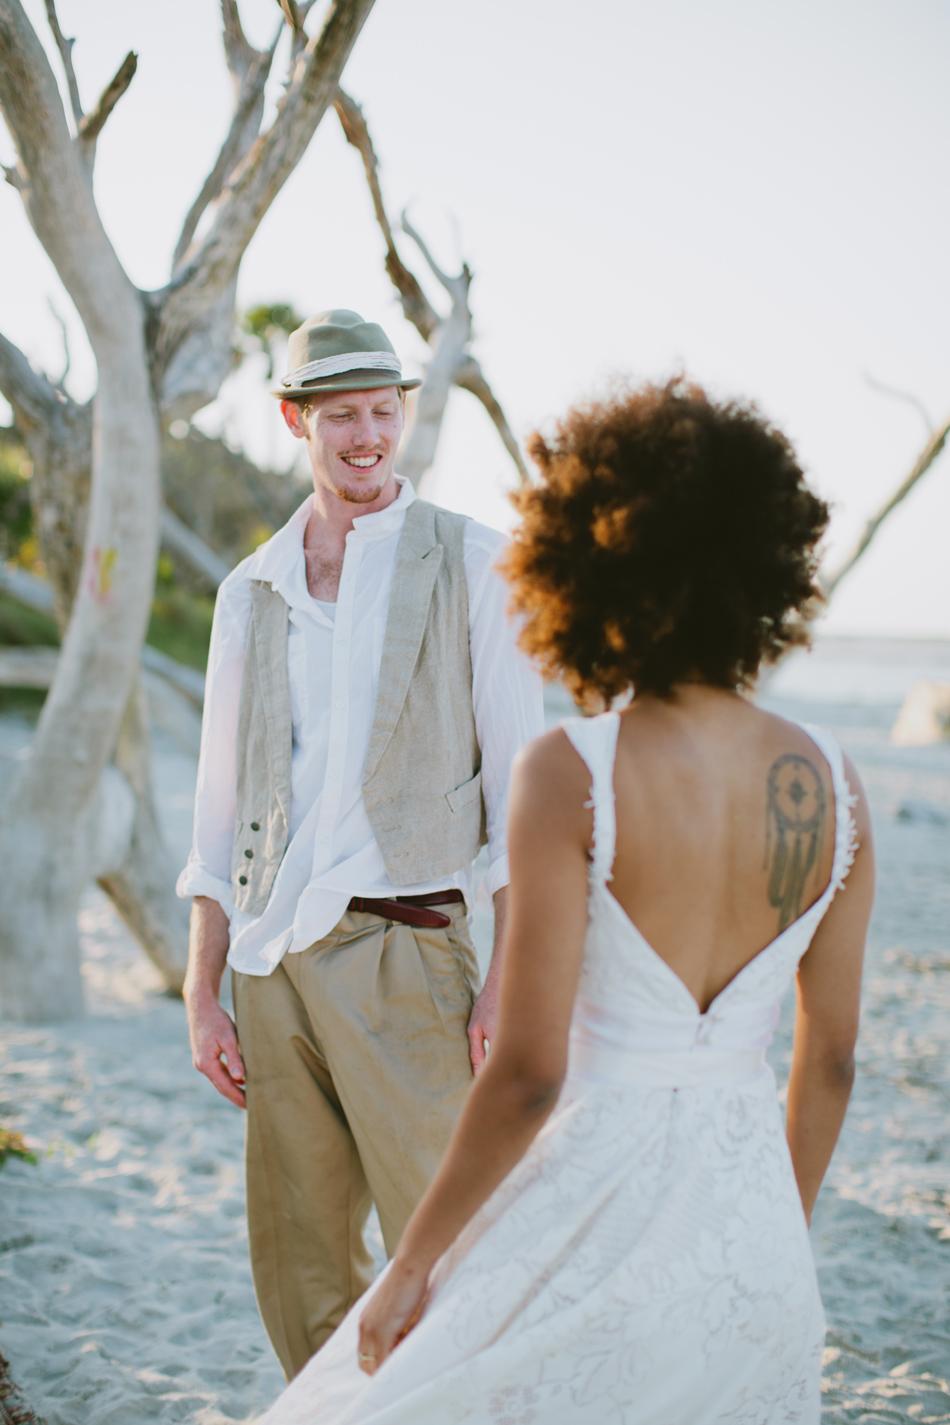 Jameykay_arlie_bohemian_elopement_styled_shoot050.jpg